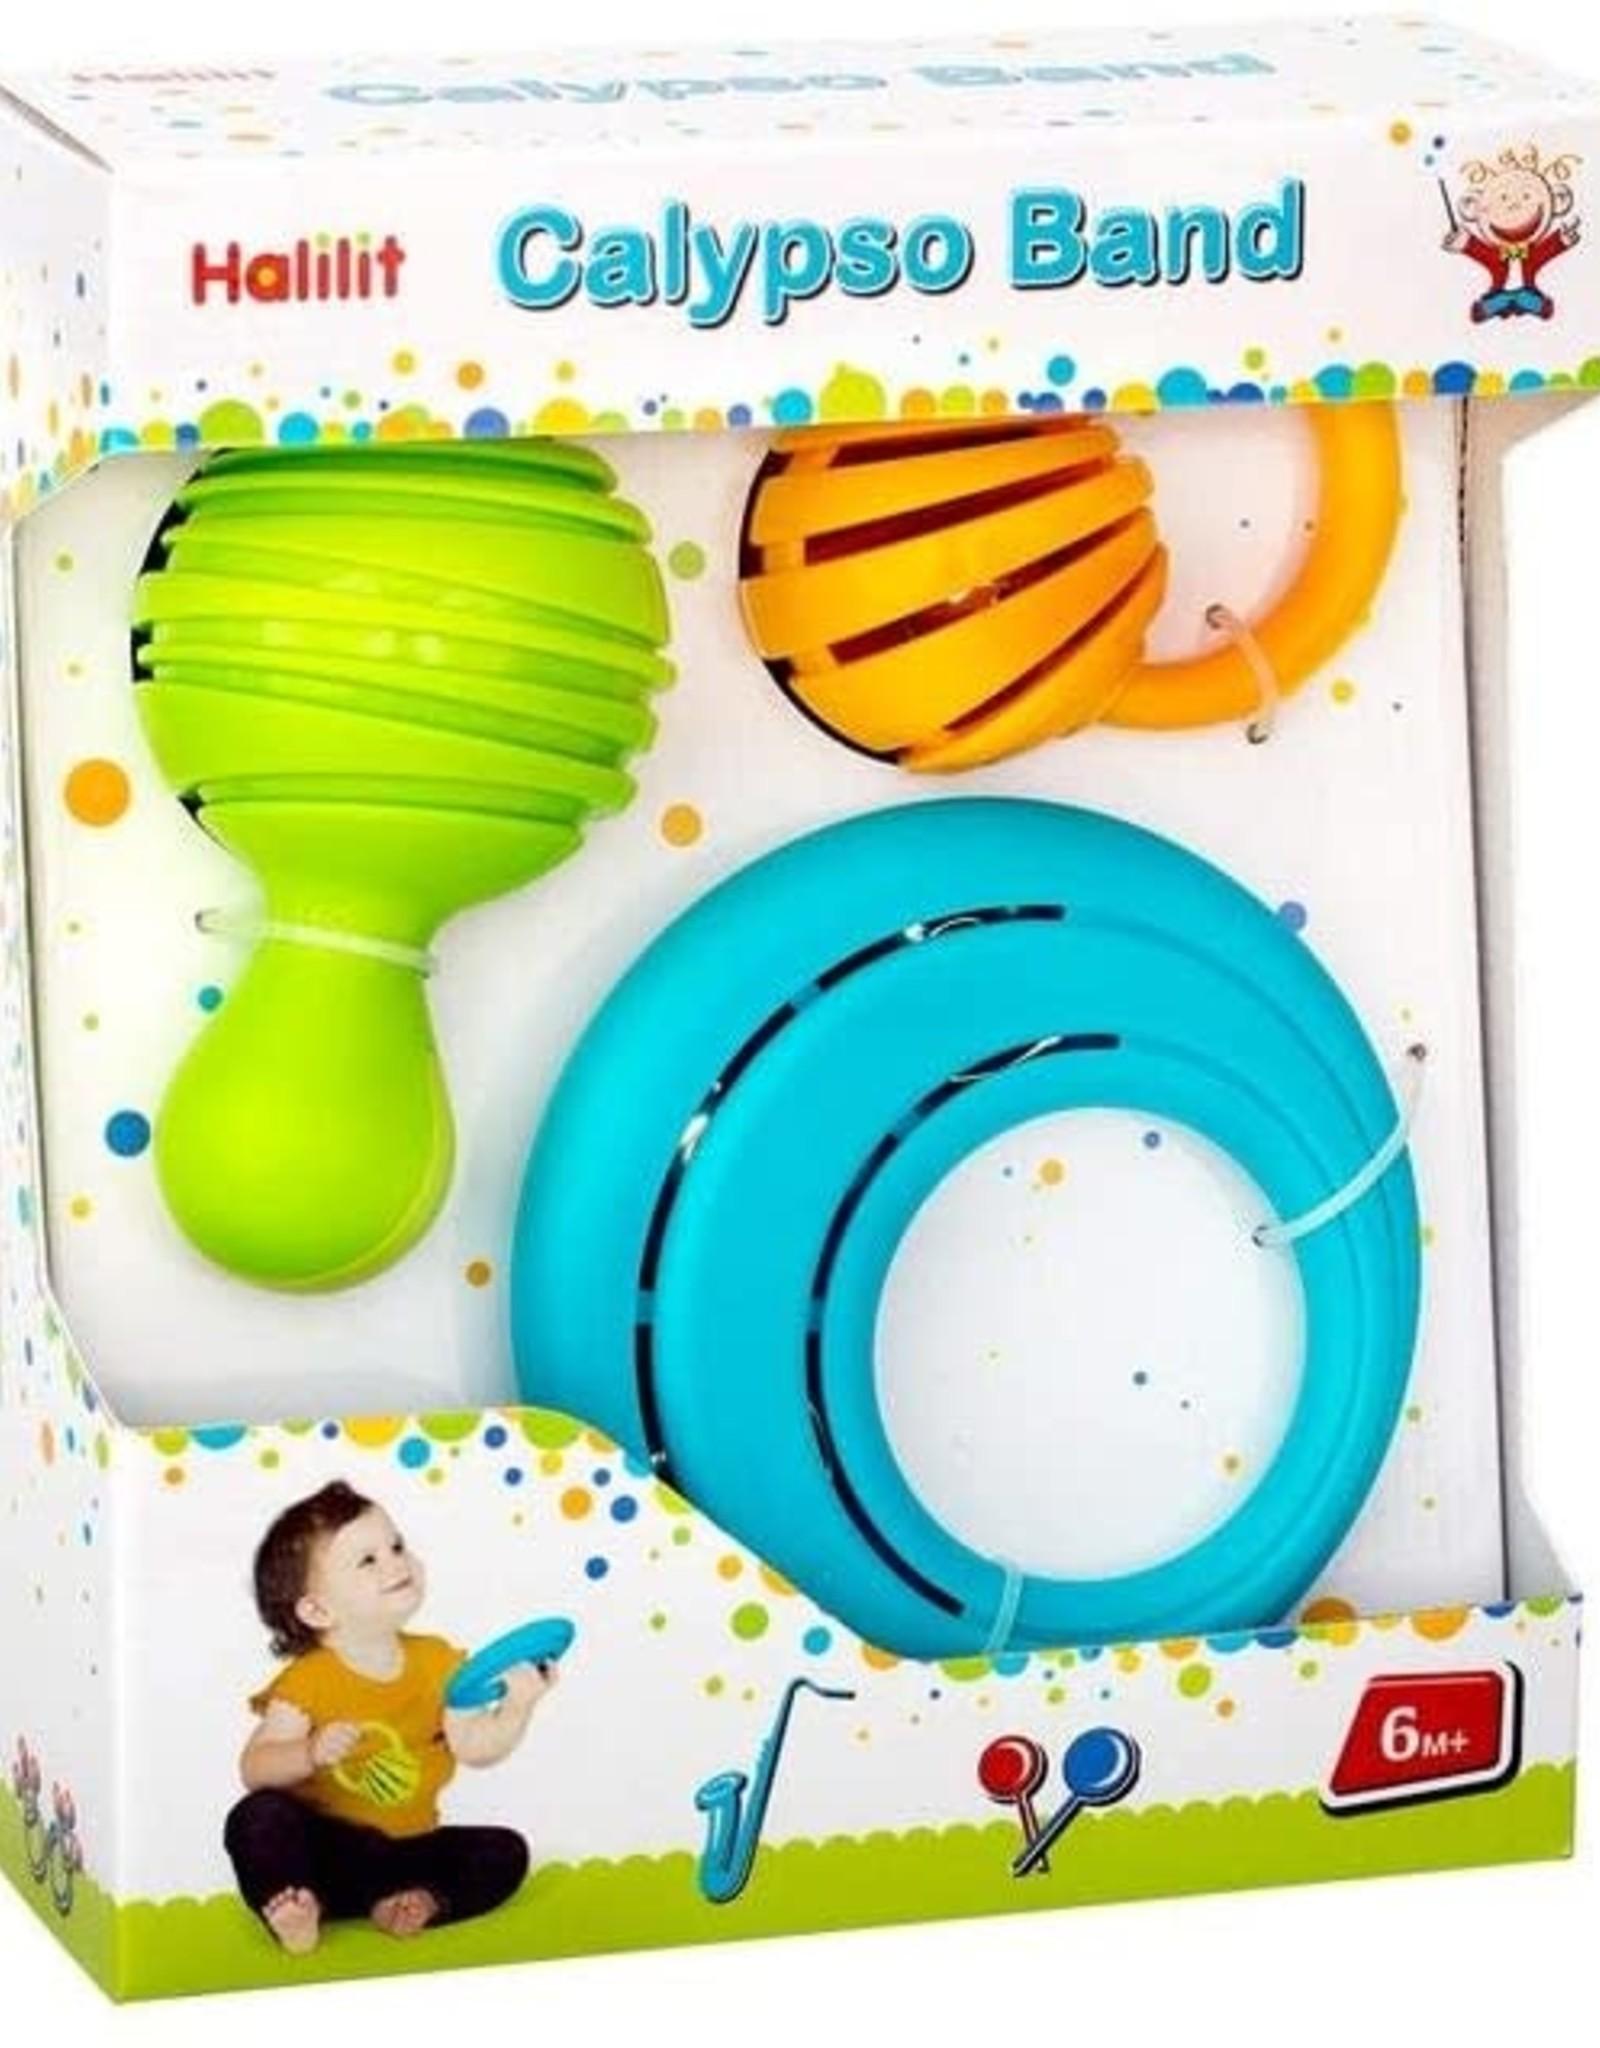 Halilit Calypso Band